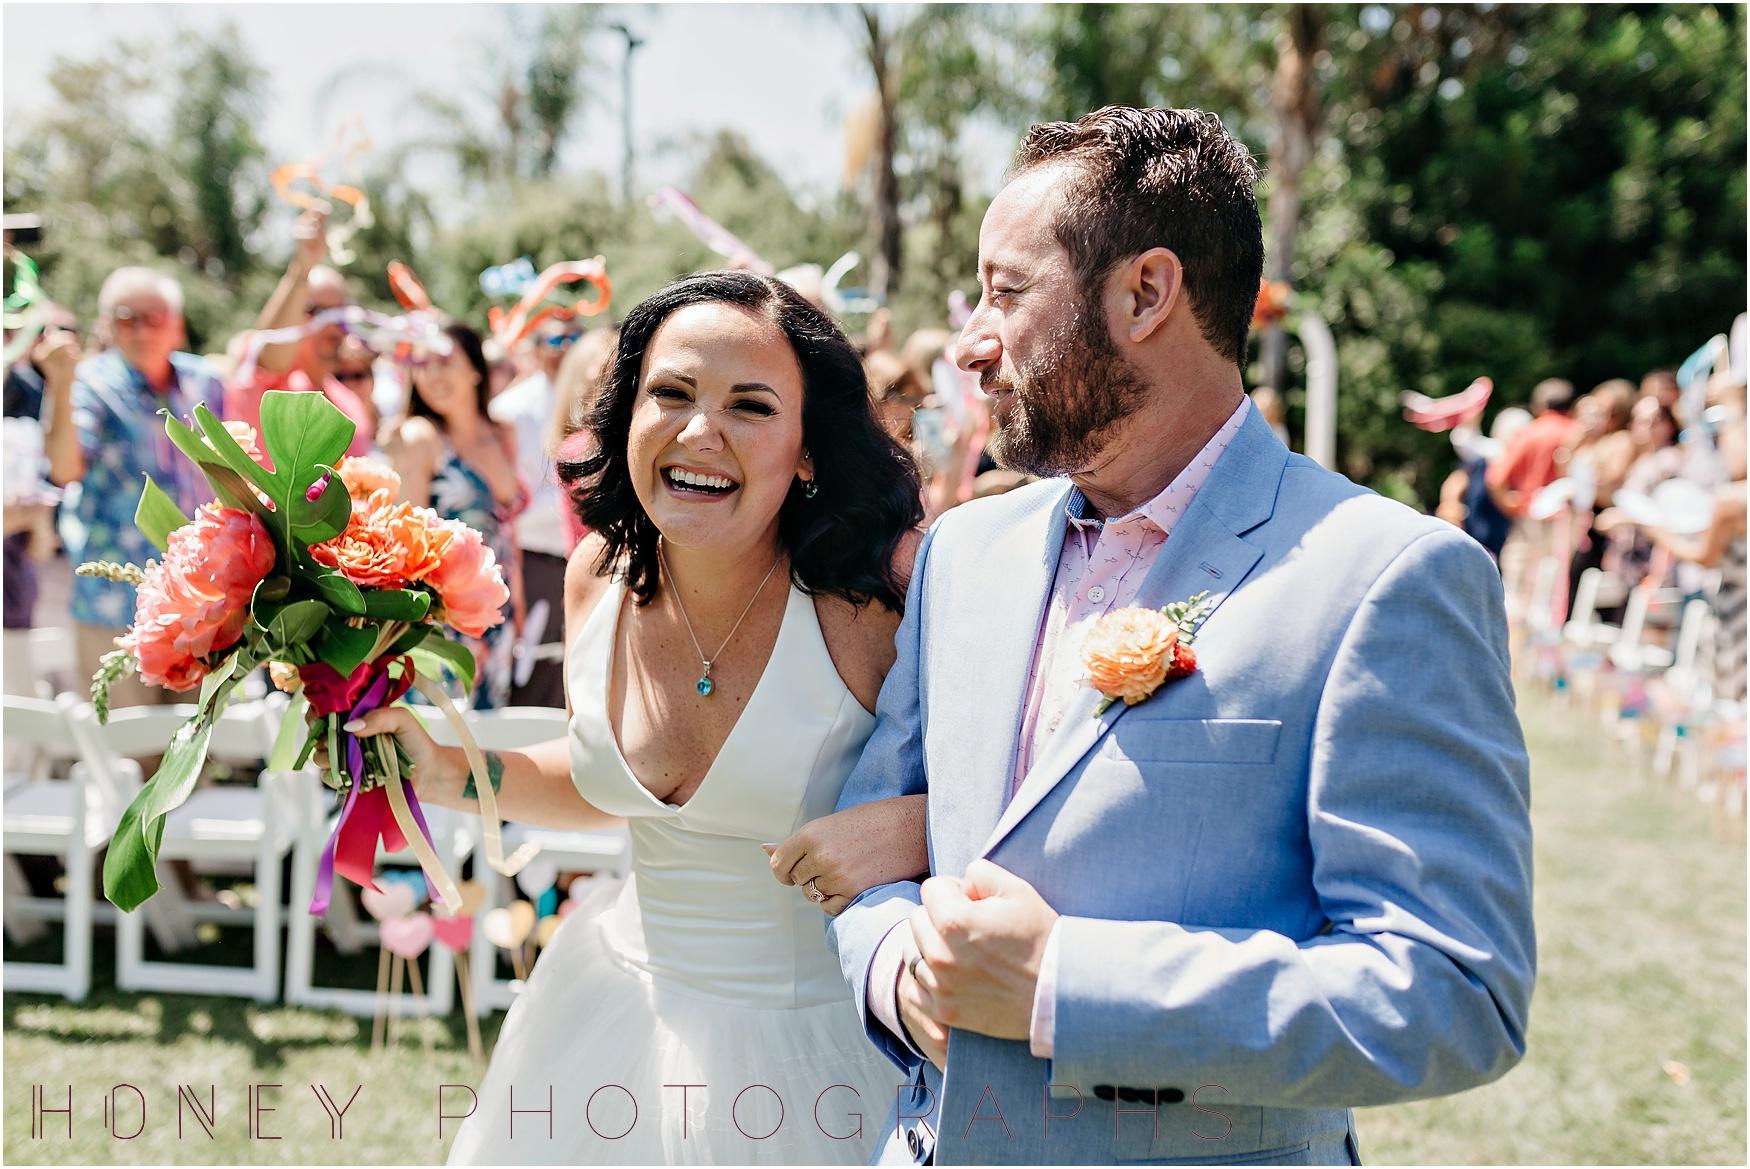 colorful_ecclectic_vibrant_vista_rainbow_quirky_wedding025.jpg